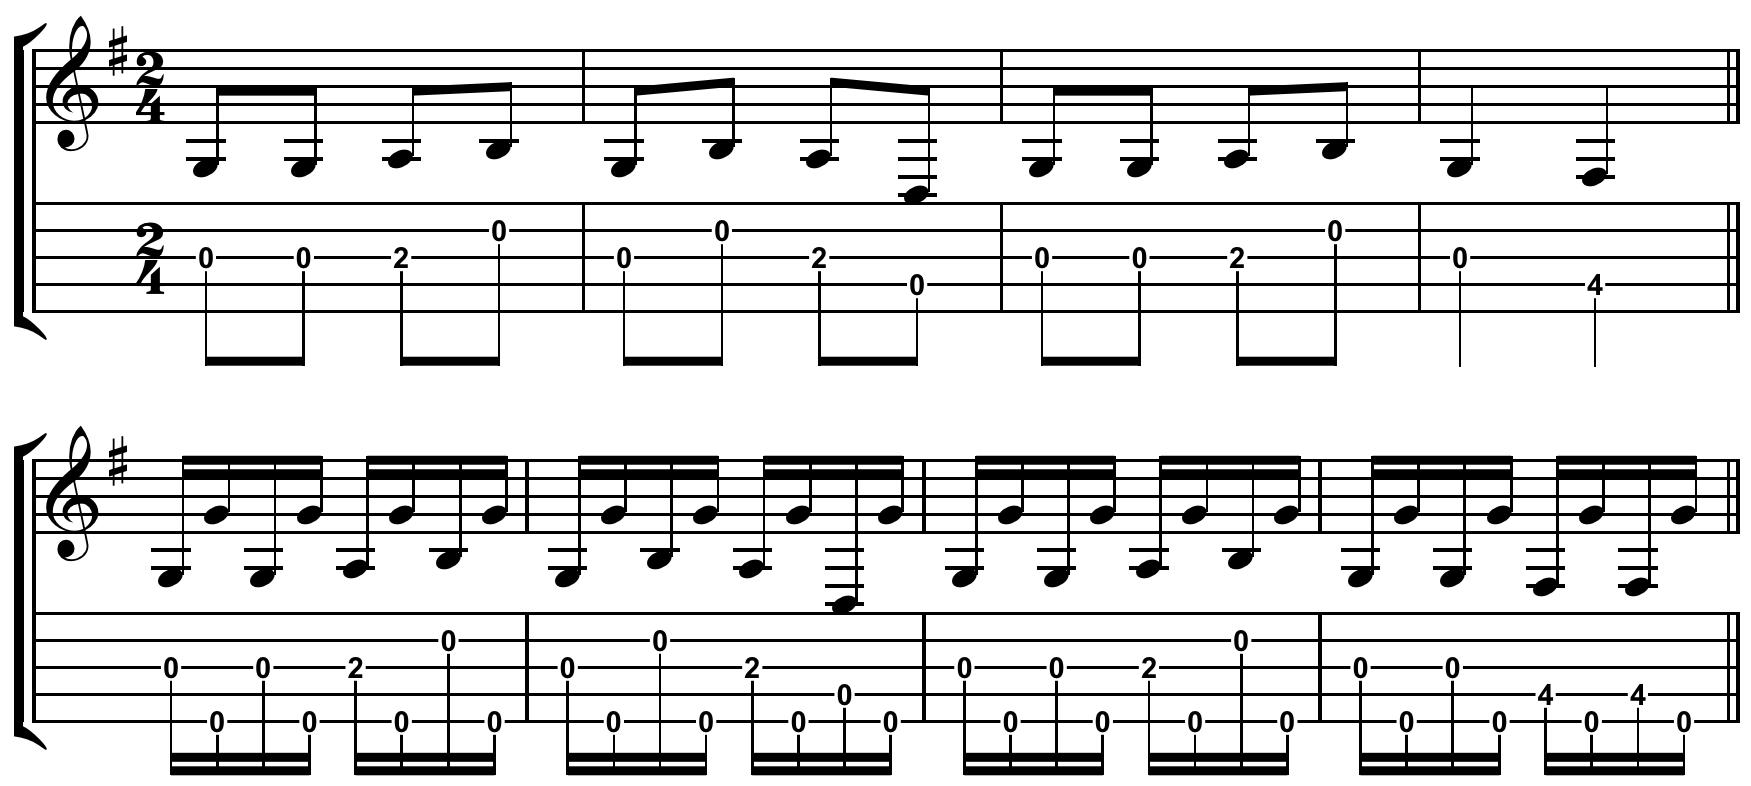 Wiki: Banjo - upcScavenger